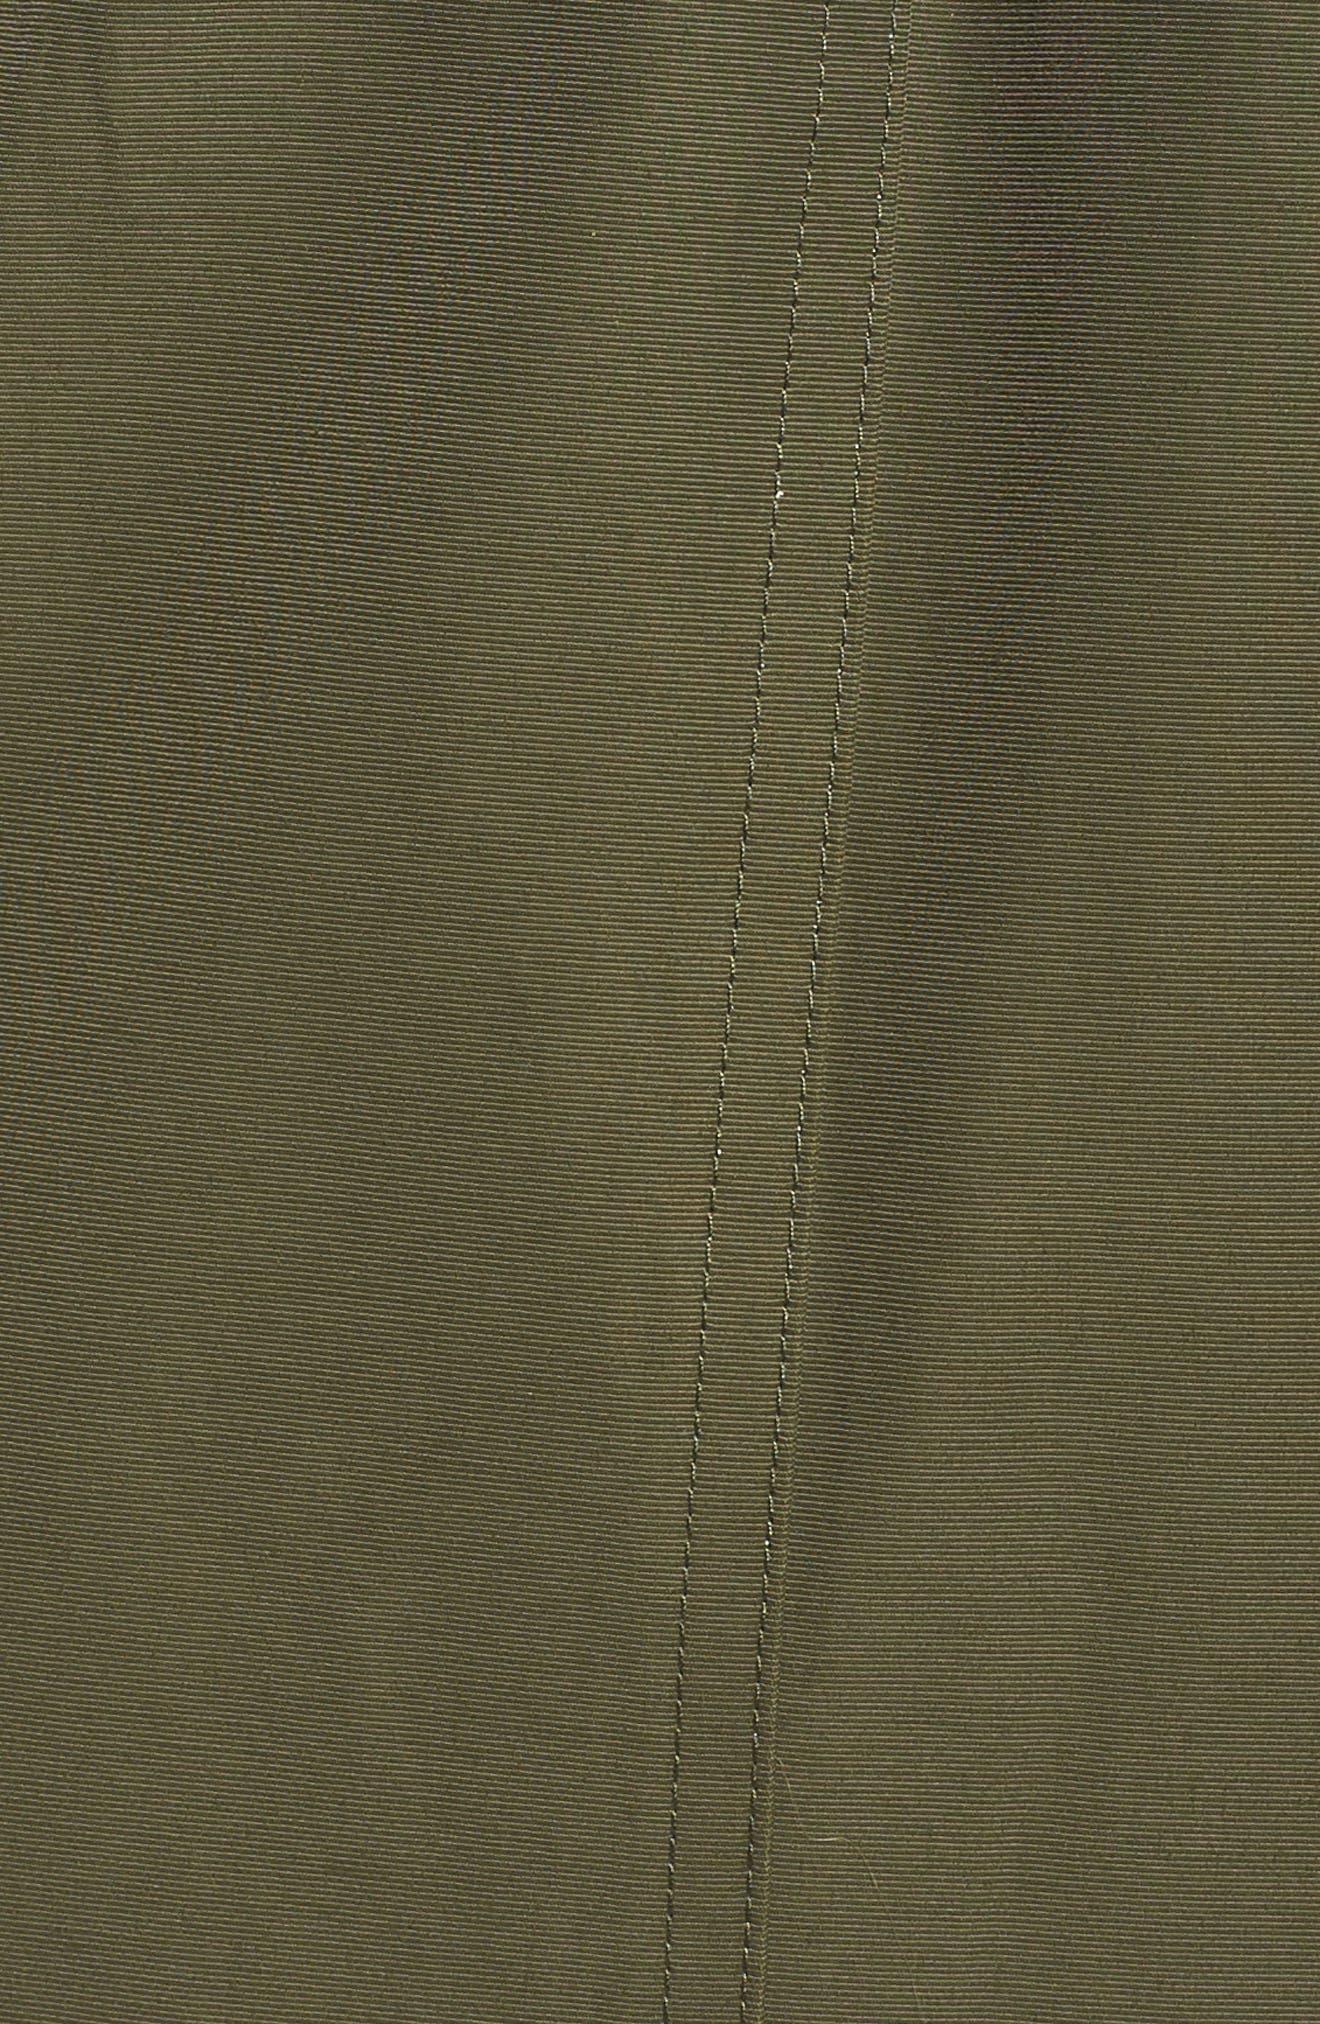 Saxton Waterproof Down Parka with Faux Fur Trim,                             Alternate thumbnail 7, color,                             300